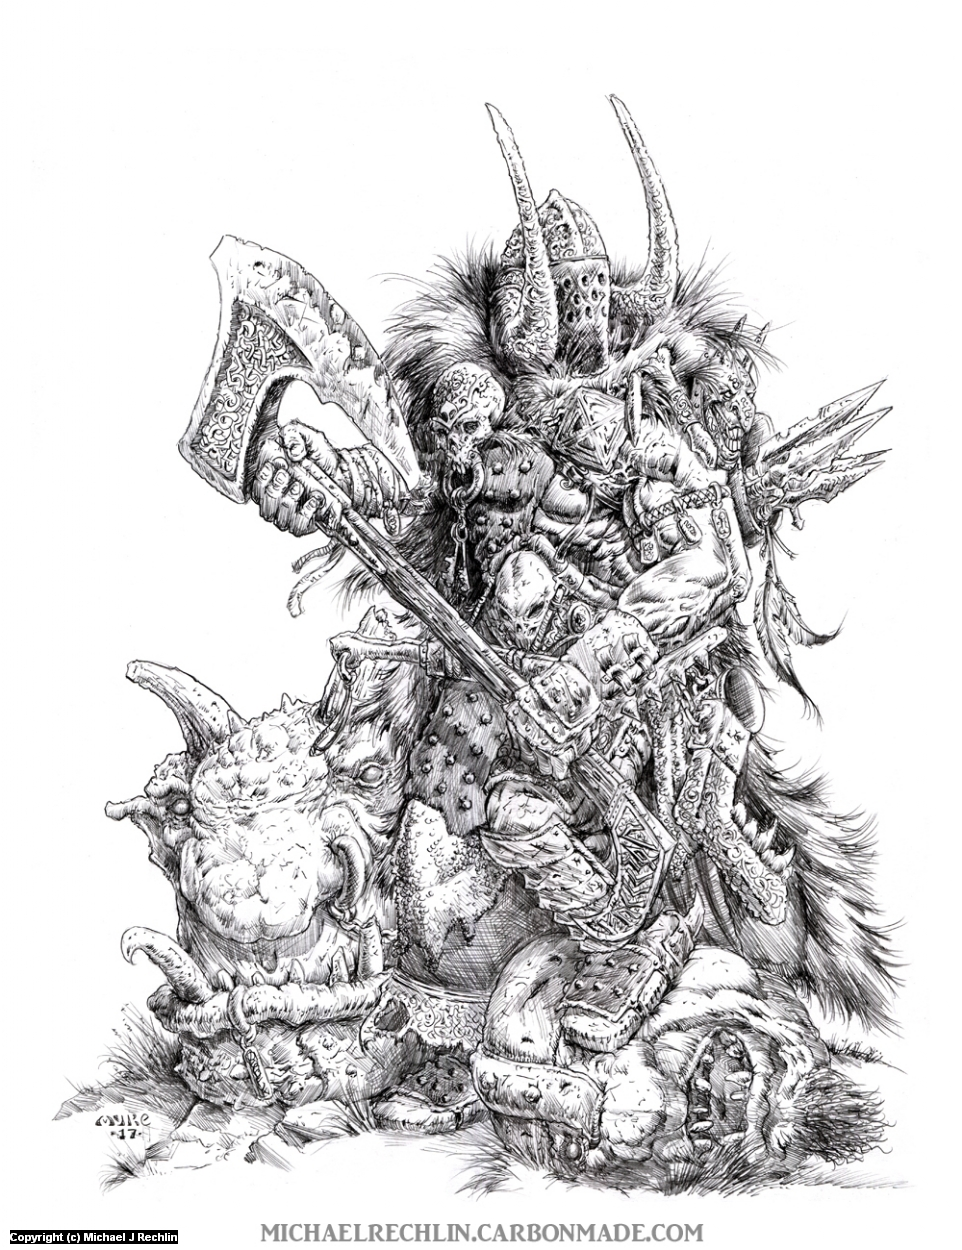 Kill Em' All Artwork by Michael Rechlin